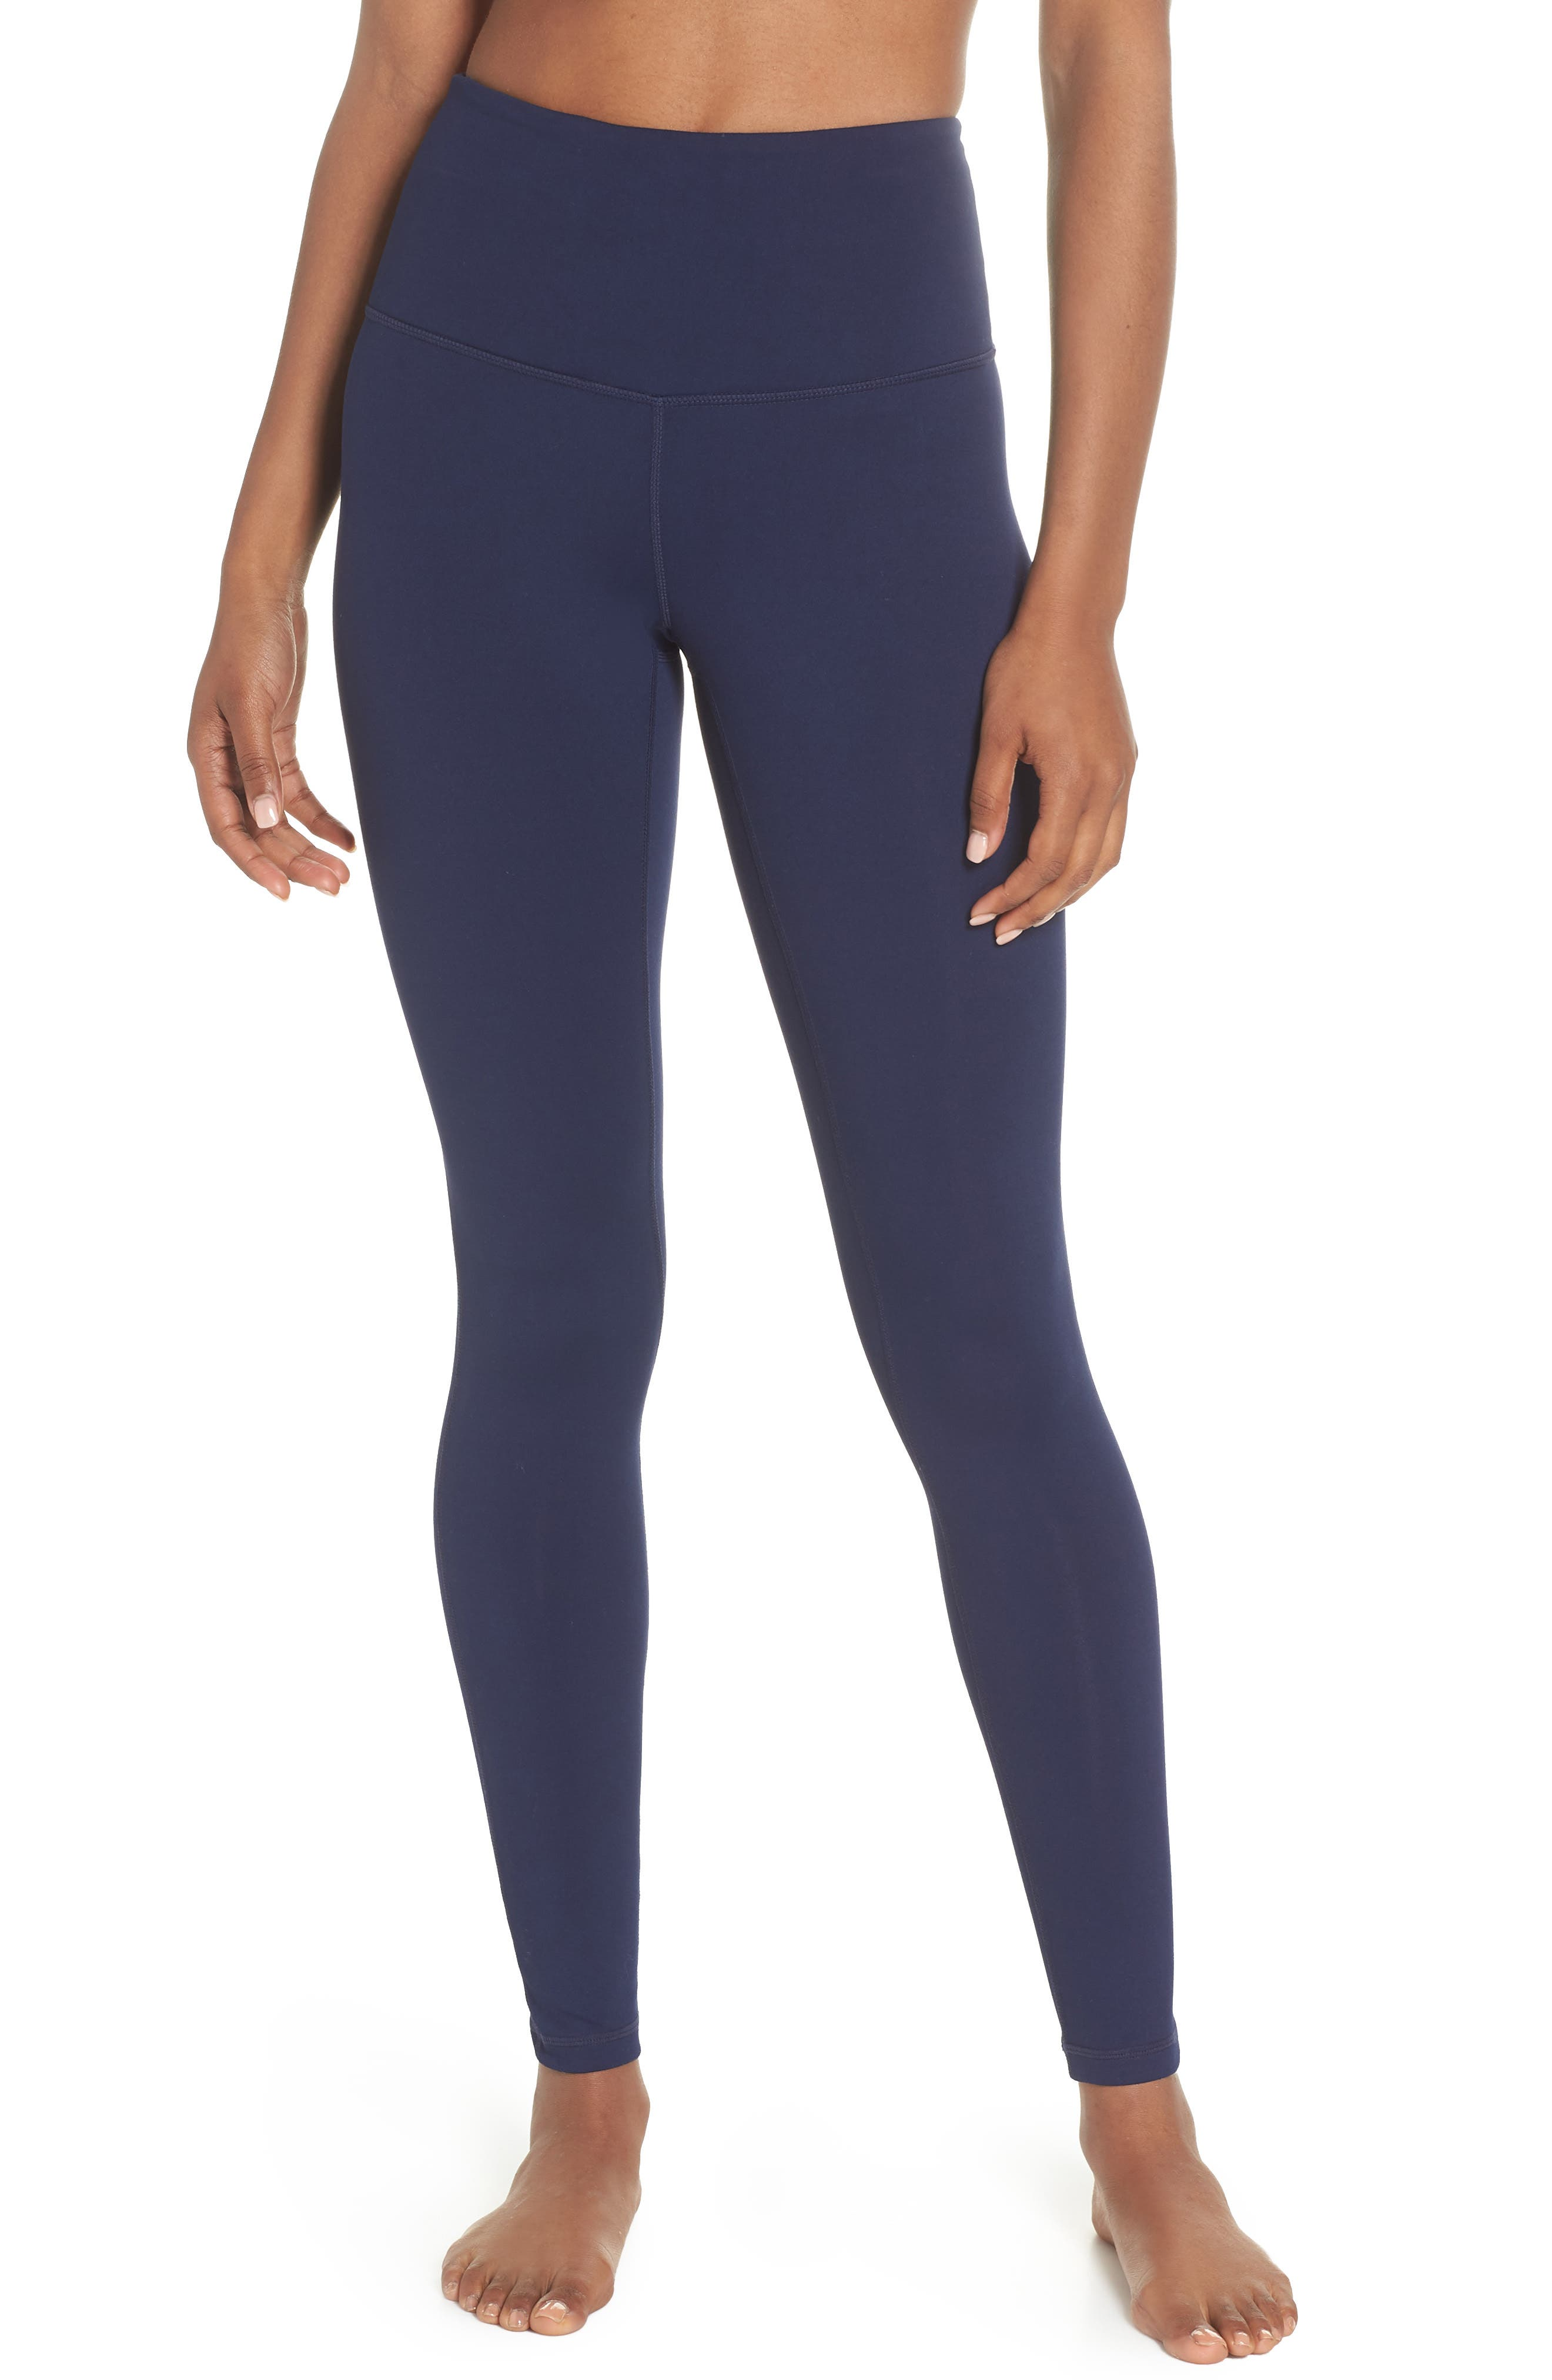 85500124a7 Leggings Zella Activewear for Women